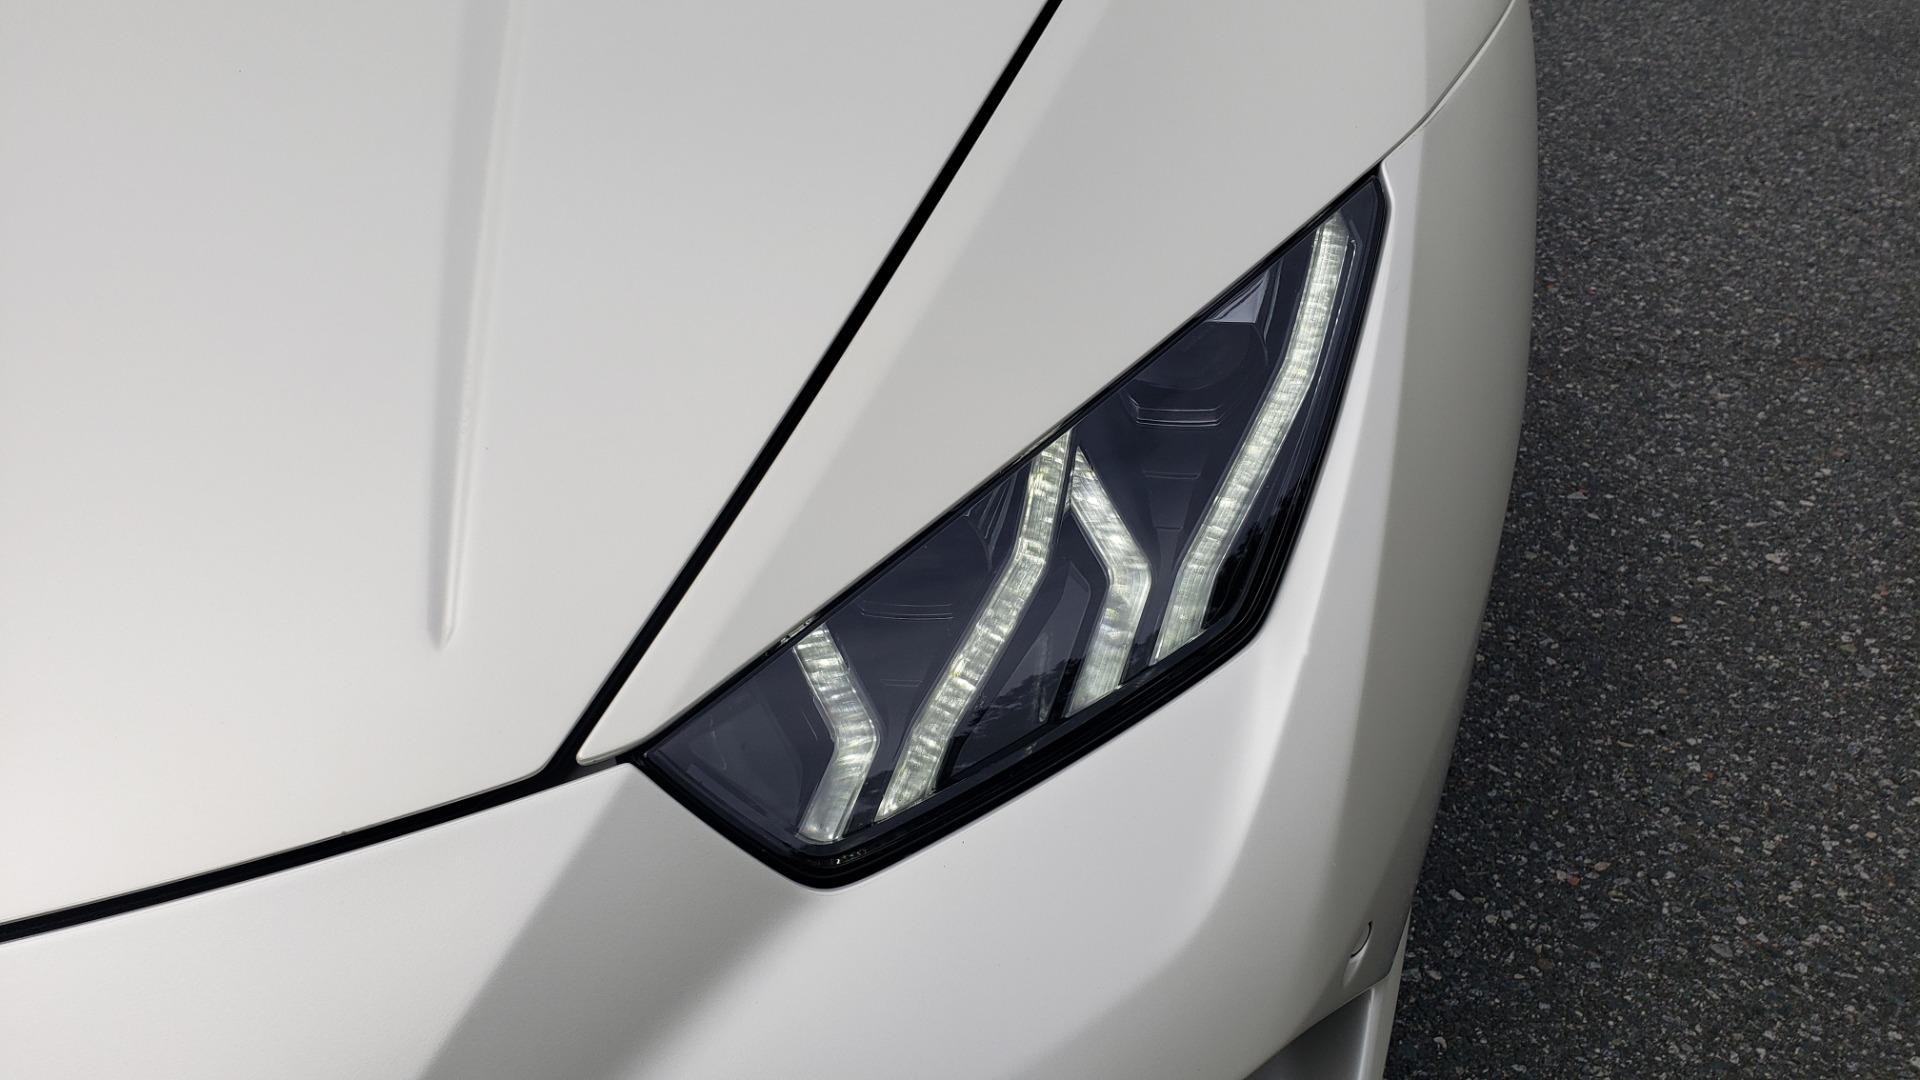 Used 2018 Lamborghini HURACAN PERFORMANTE 5.2L V10 / 630HP / 7-SPD AUTO / AWD / NAV / PREM SND for sale $269,995 at Formula Imports in Charlotte NC 28227 19